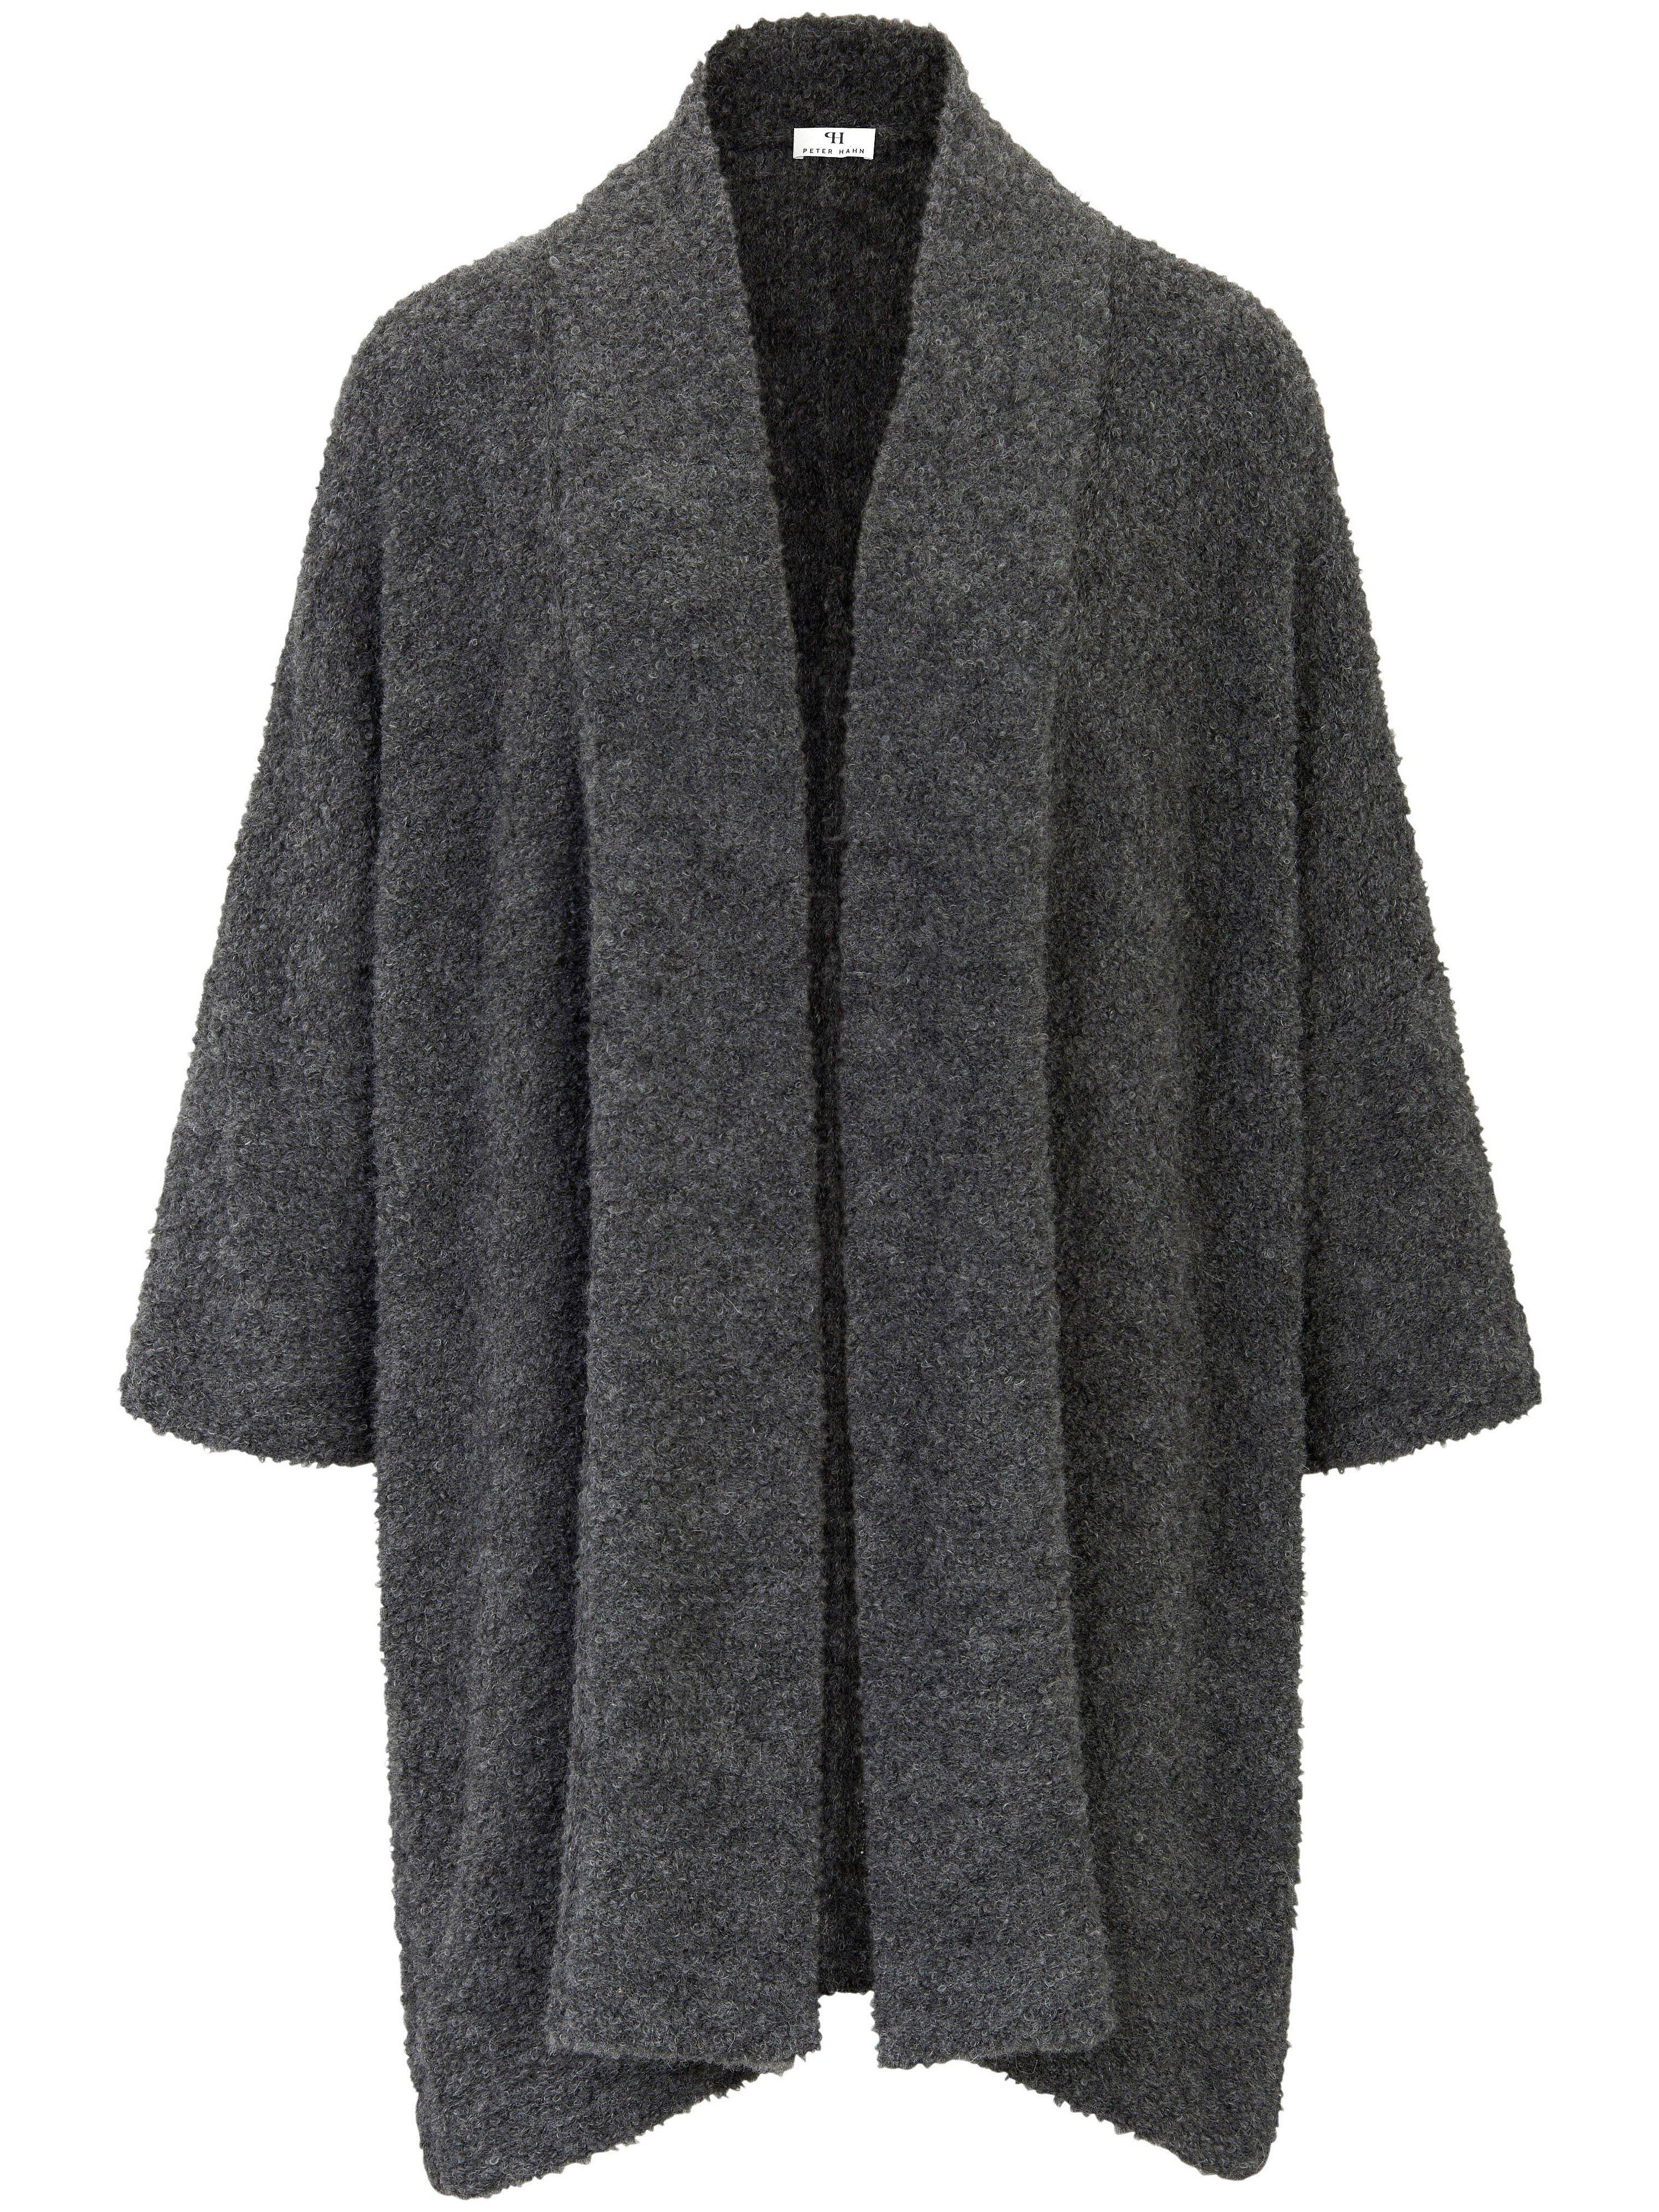 Cardigan in swing-coat style Peter Hahn grey